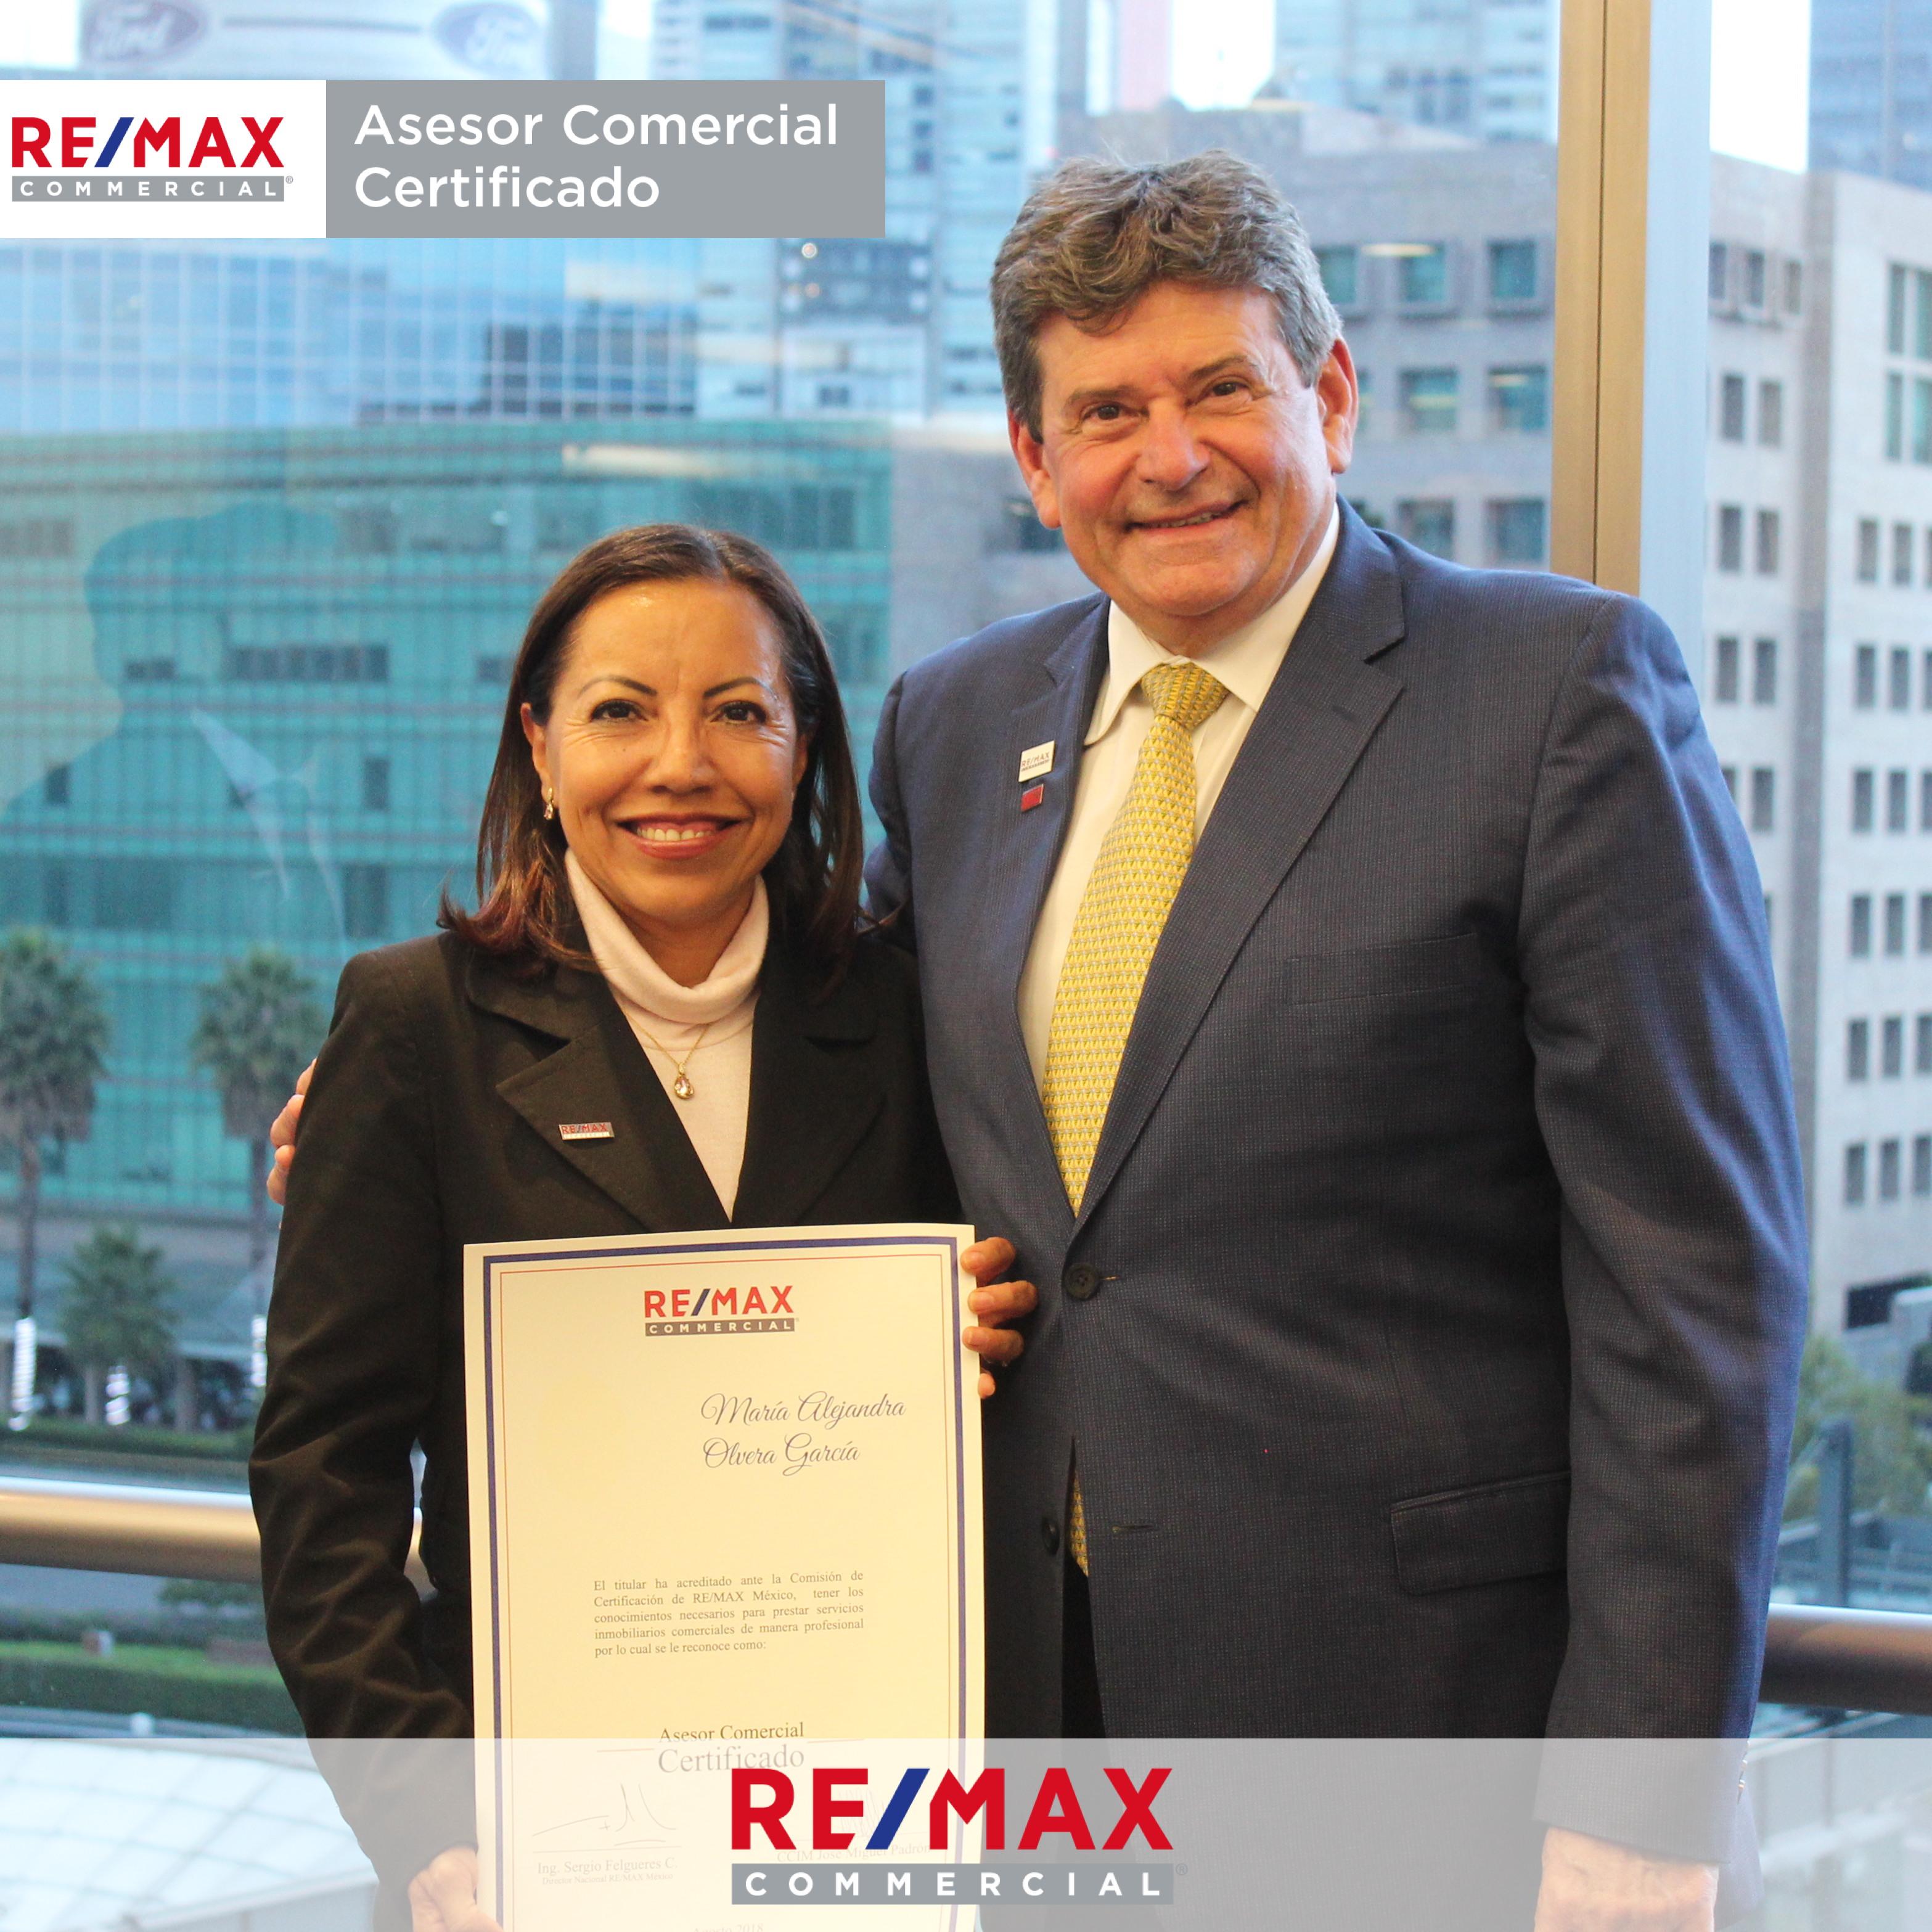 21_Certificacion_comercial_comprar_rentar_vender_casa_departamento_franquicias_inmobiliarias_REMAX_mexico_propiedades_comerciales_terrenos_bodegas